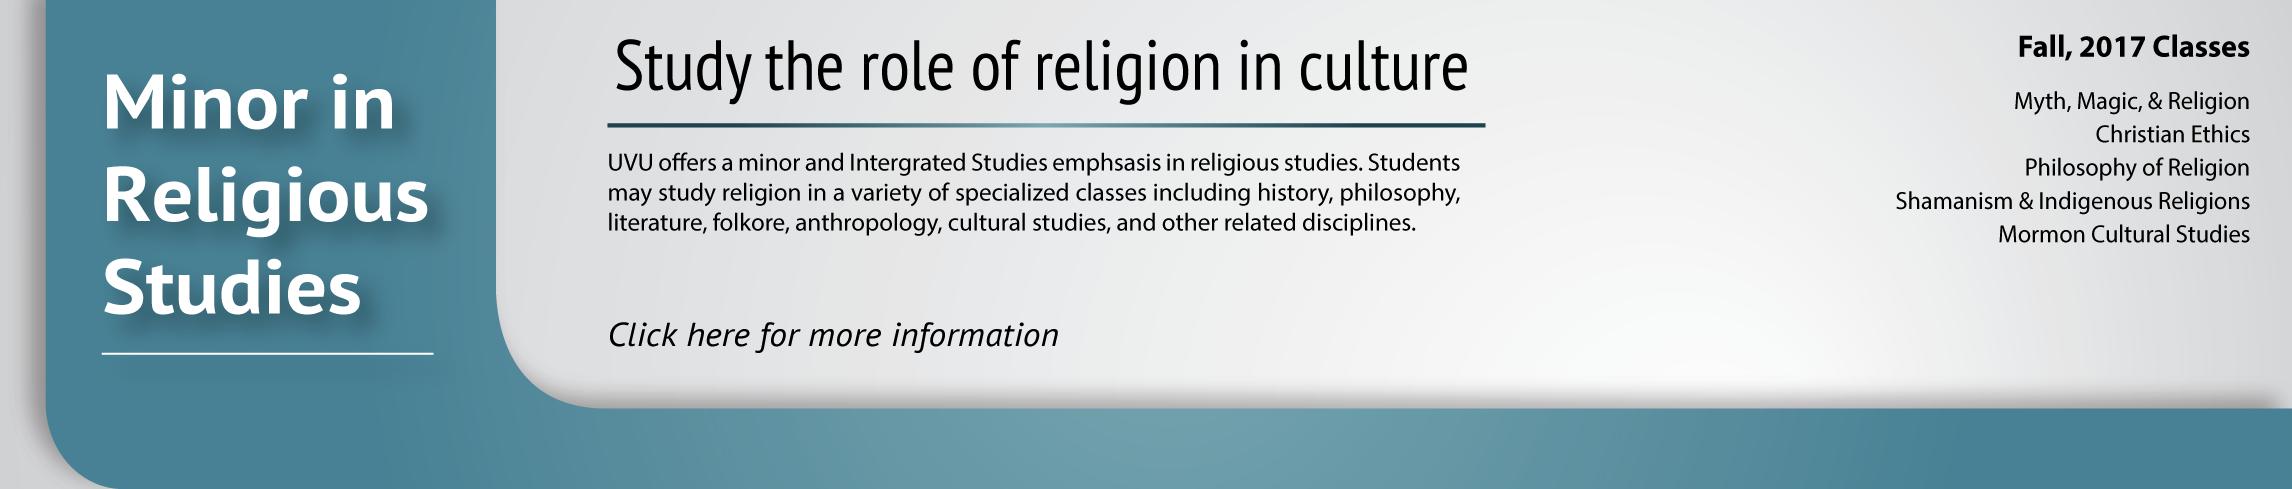 Religious Studies Minor